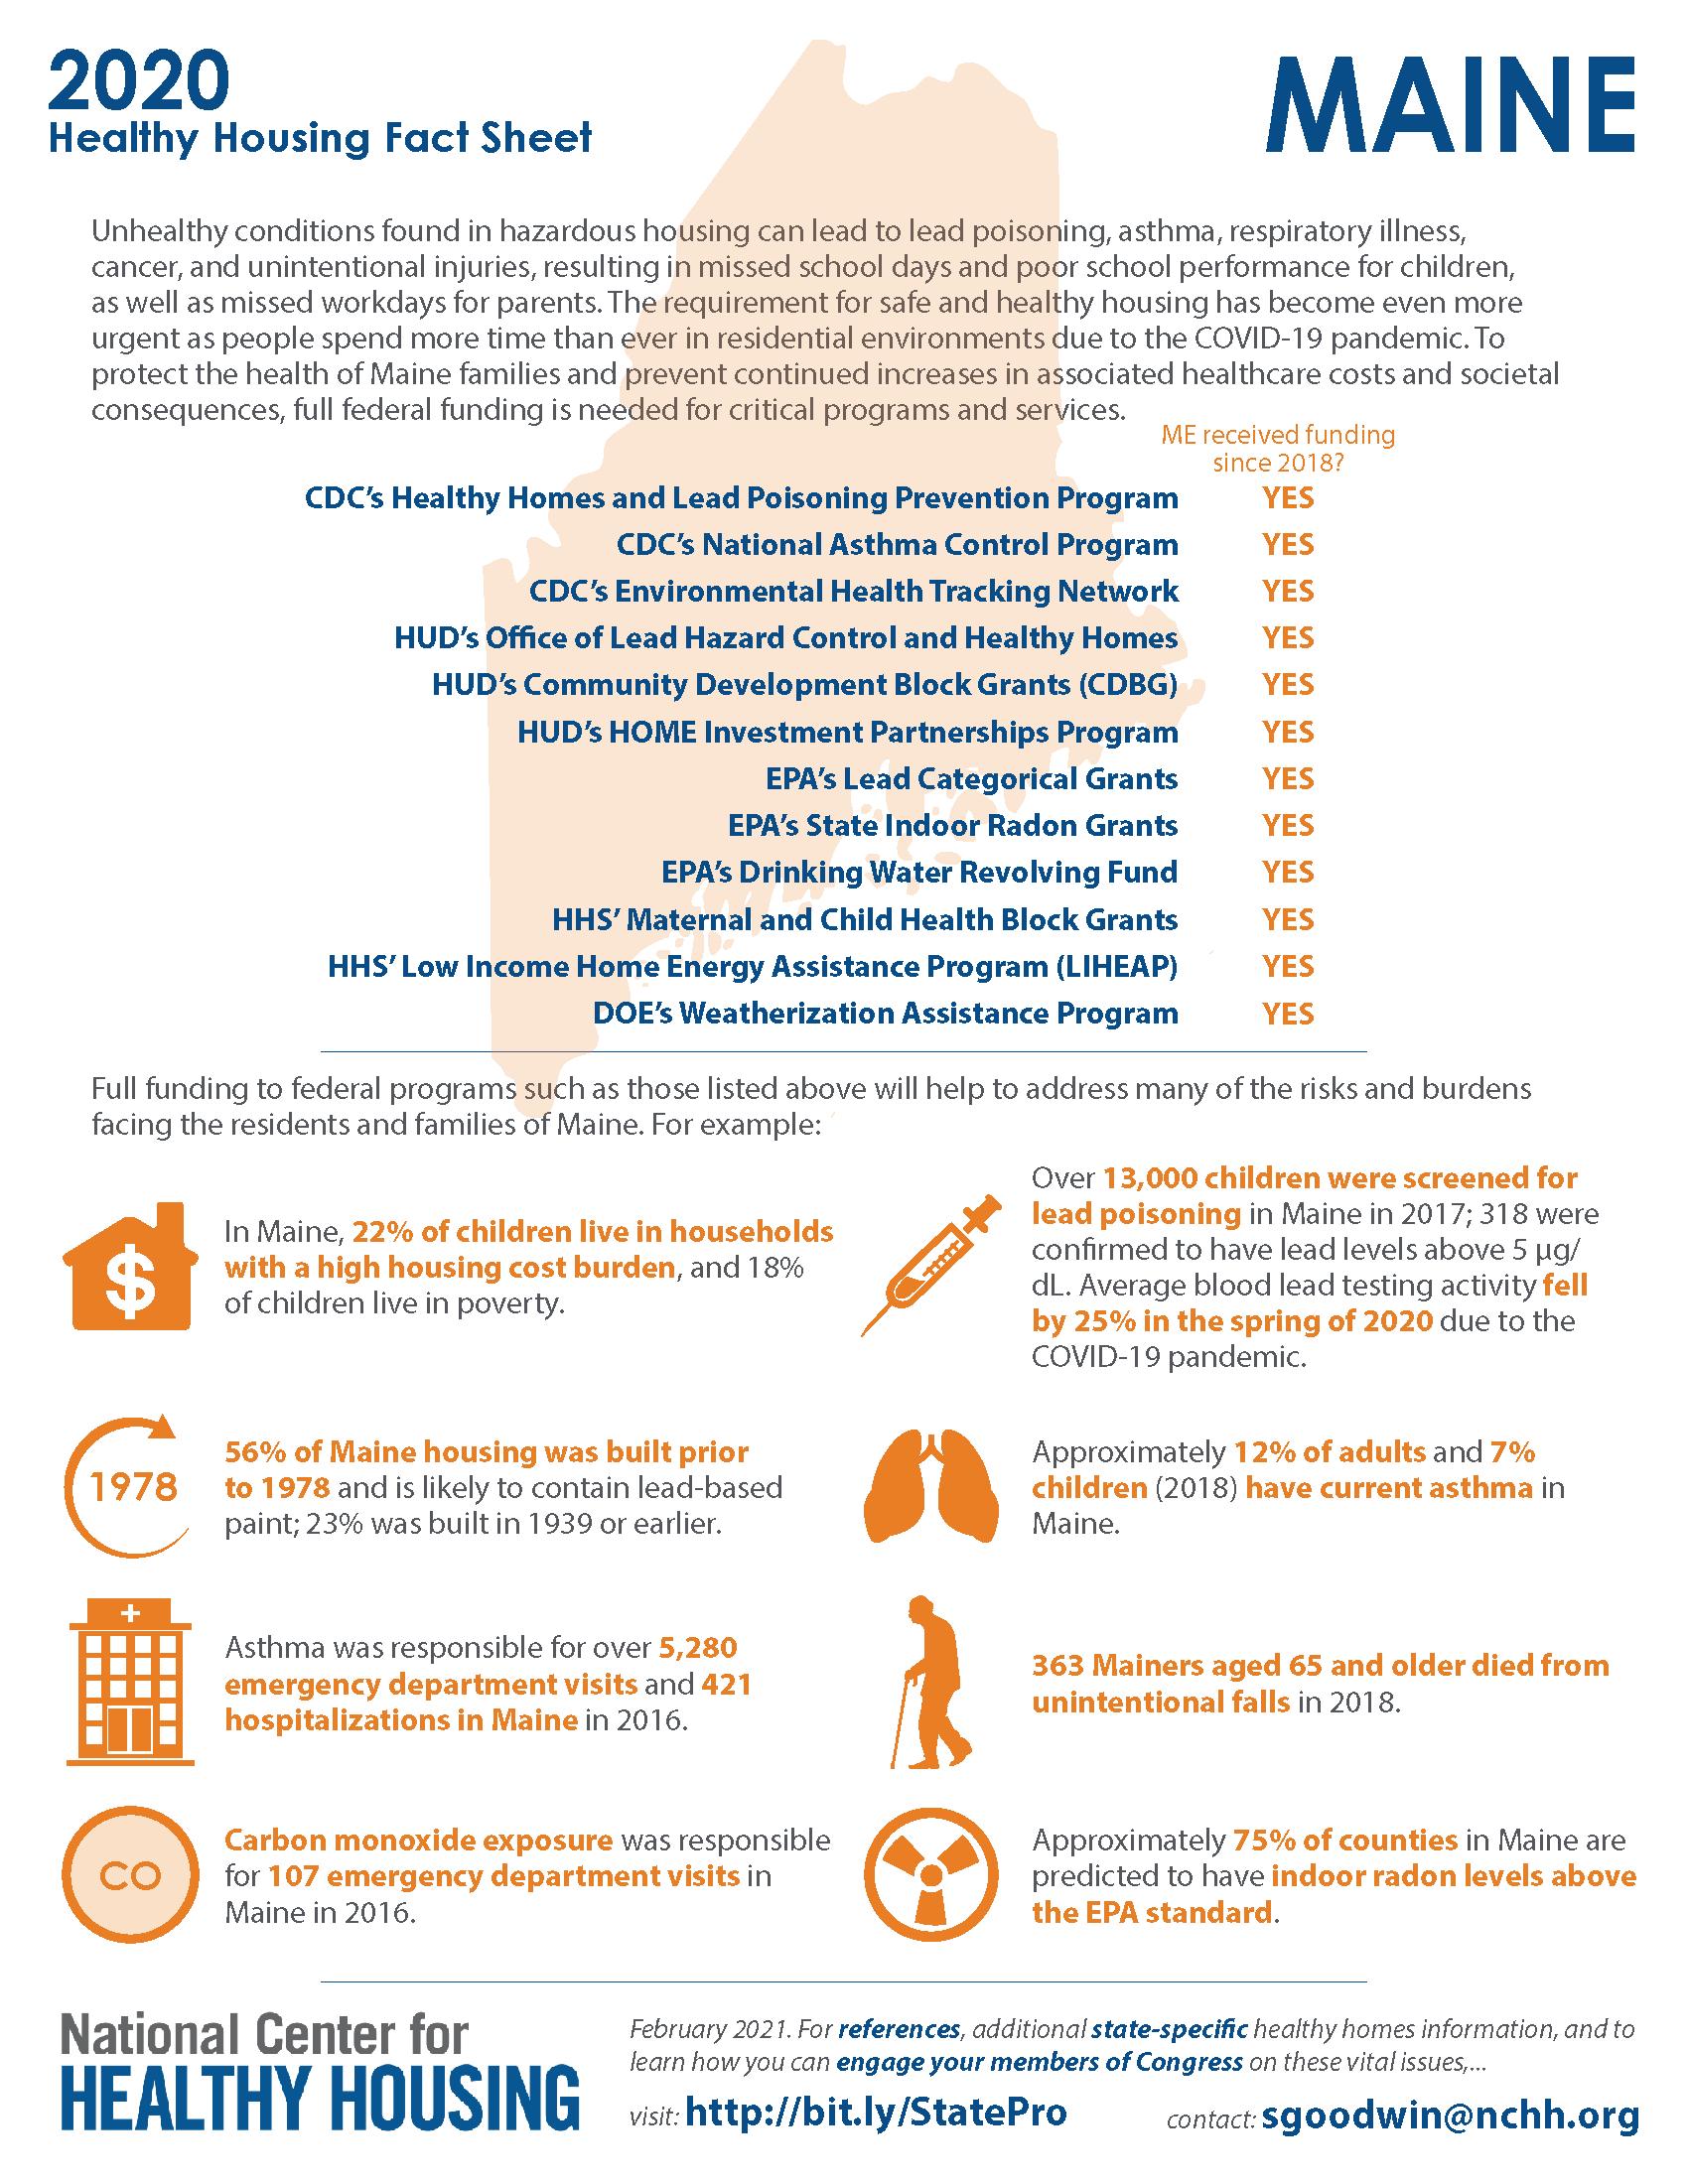 Healthy Housing Fact Sheet - Maine 2020